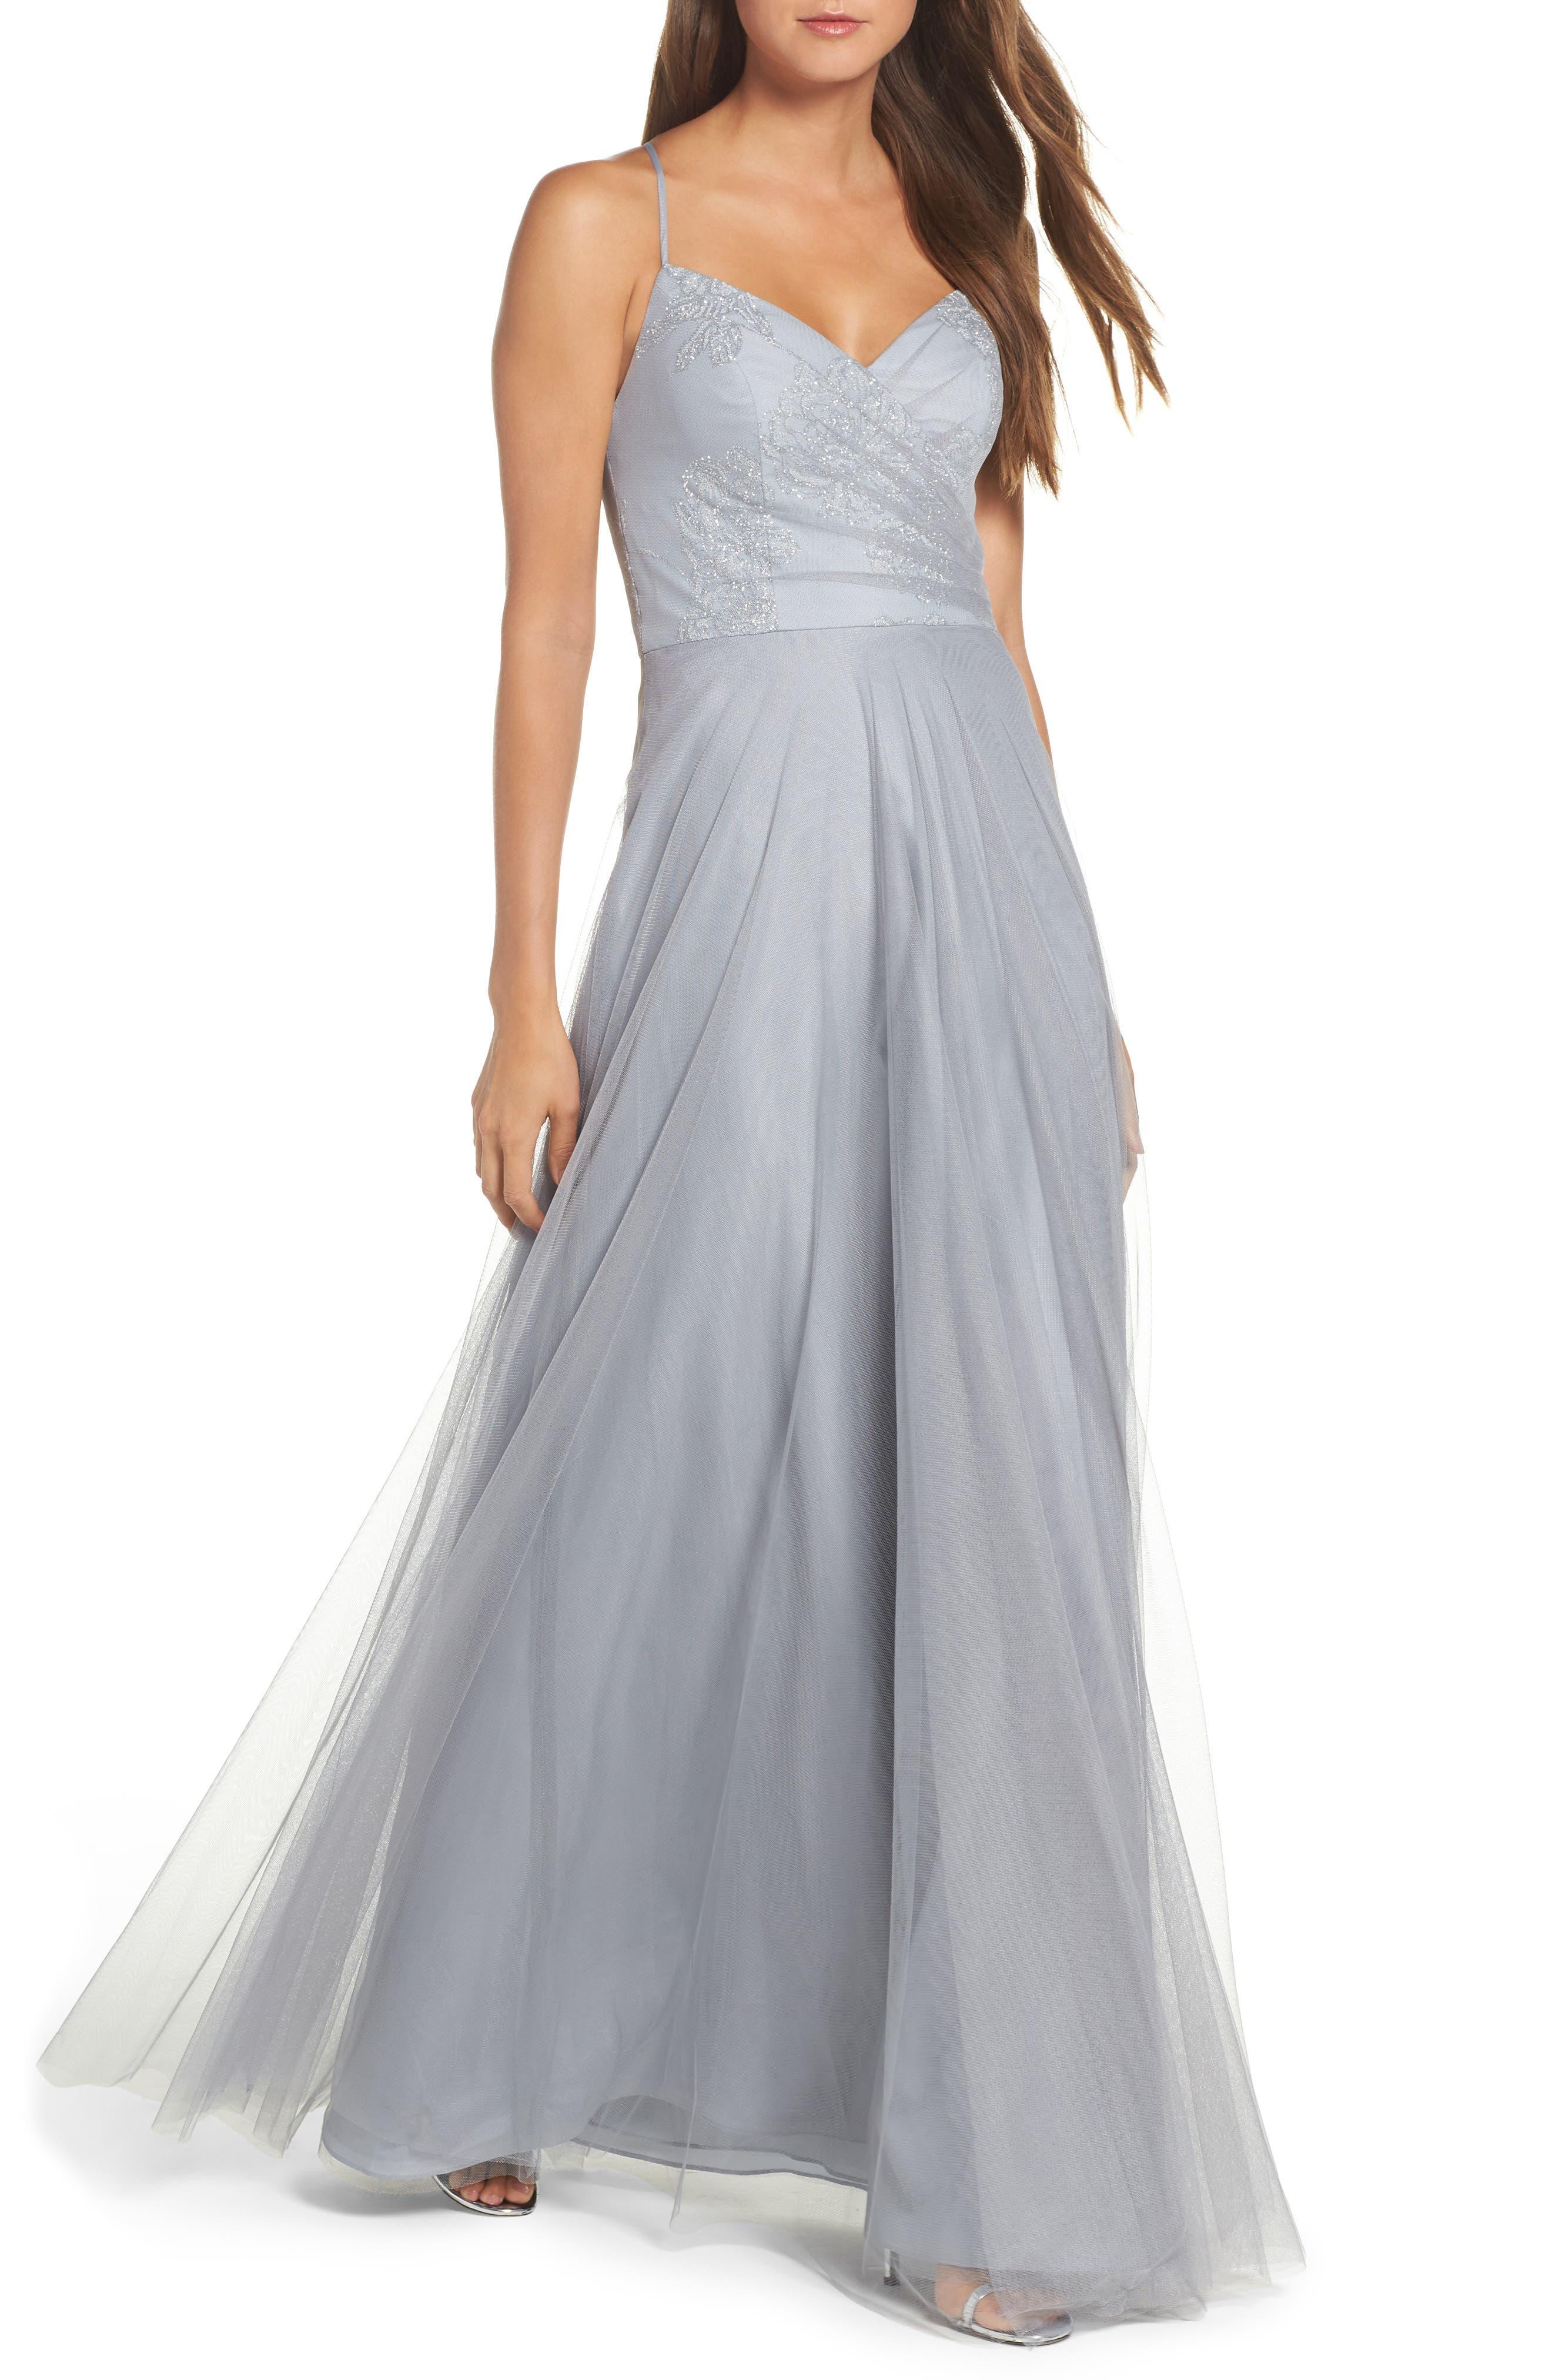 department store prom dresses